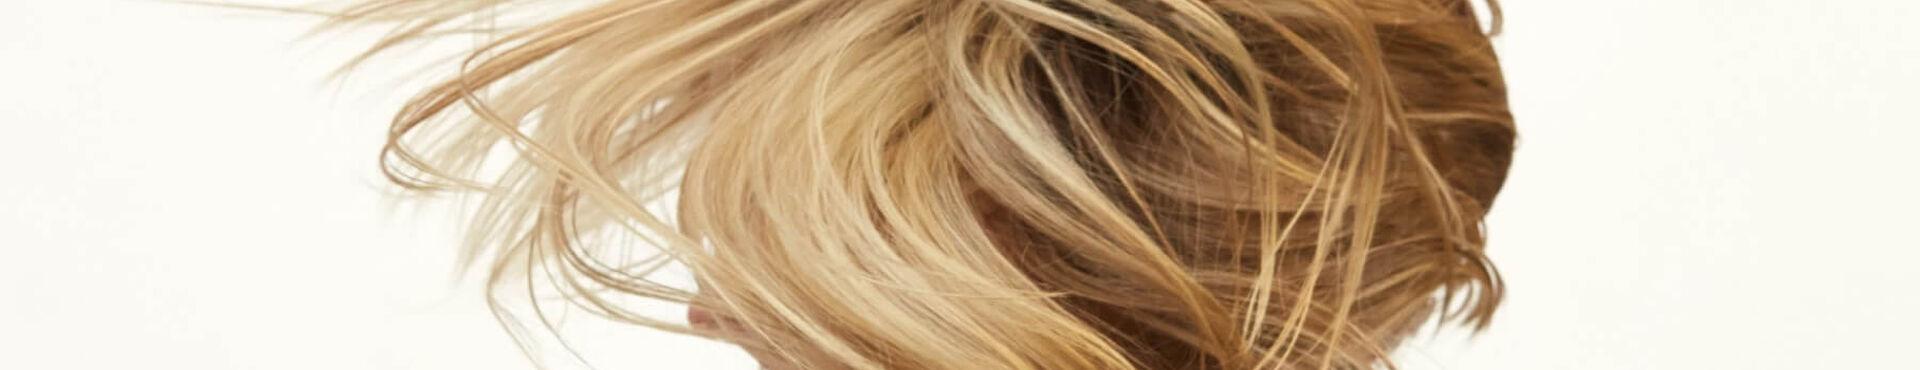 Banner - Keeping Blond Hair Bright